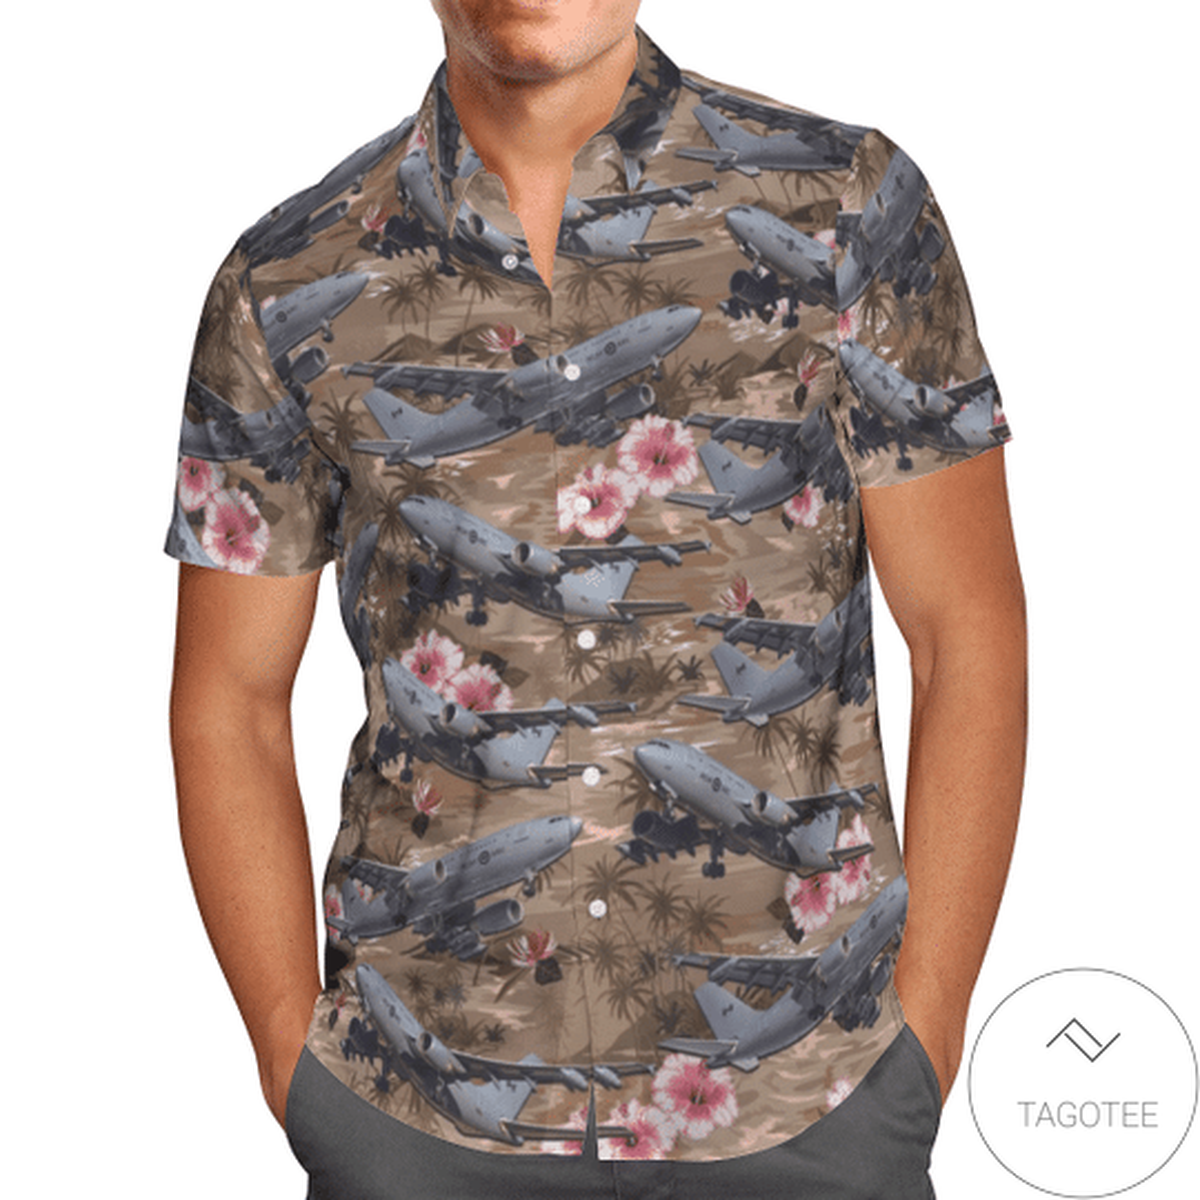 Airb us Cc-150 Polaris (A310-304(F) Vintage Hawaiian Shirt